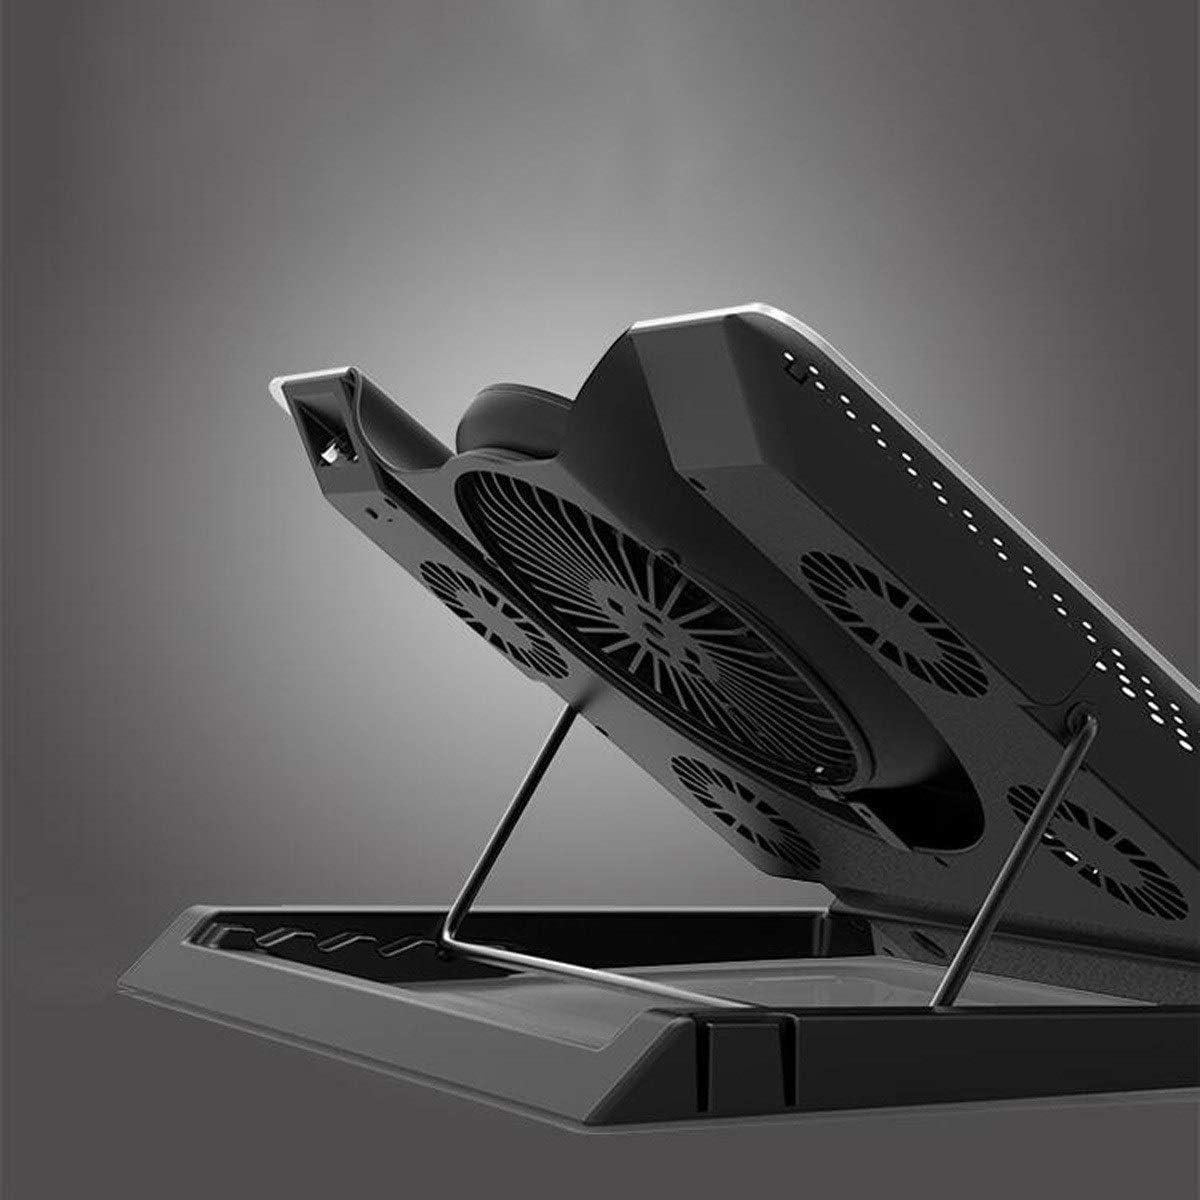 Aluminum Bracket Base Radiator 1 Large Fan 4 Small Fan for Laptop 17 Inches Black,Efficient Heat Dissipation Jingfengtongxun Laptop Radiator Color : Silver